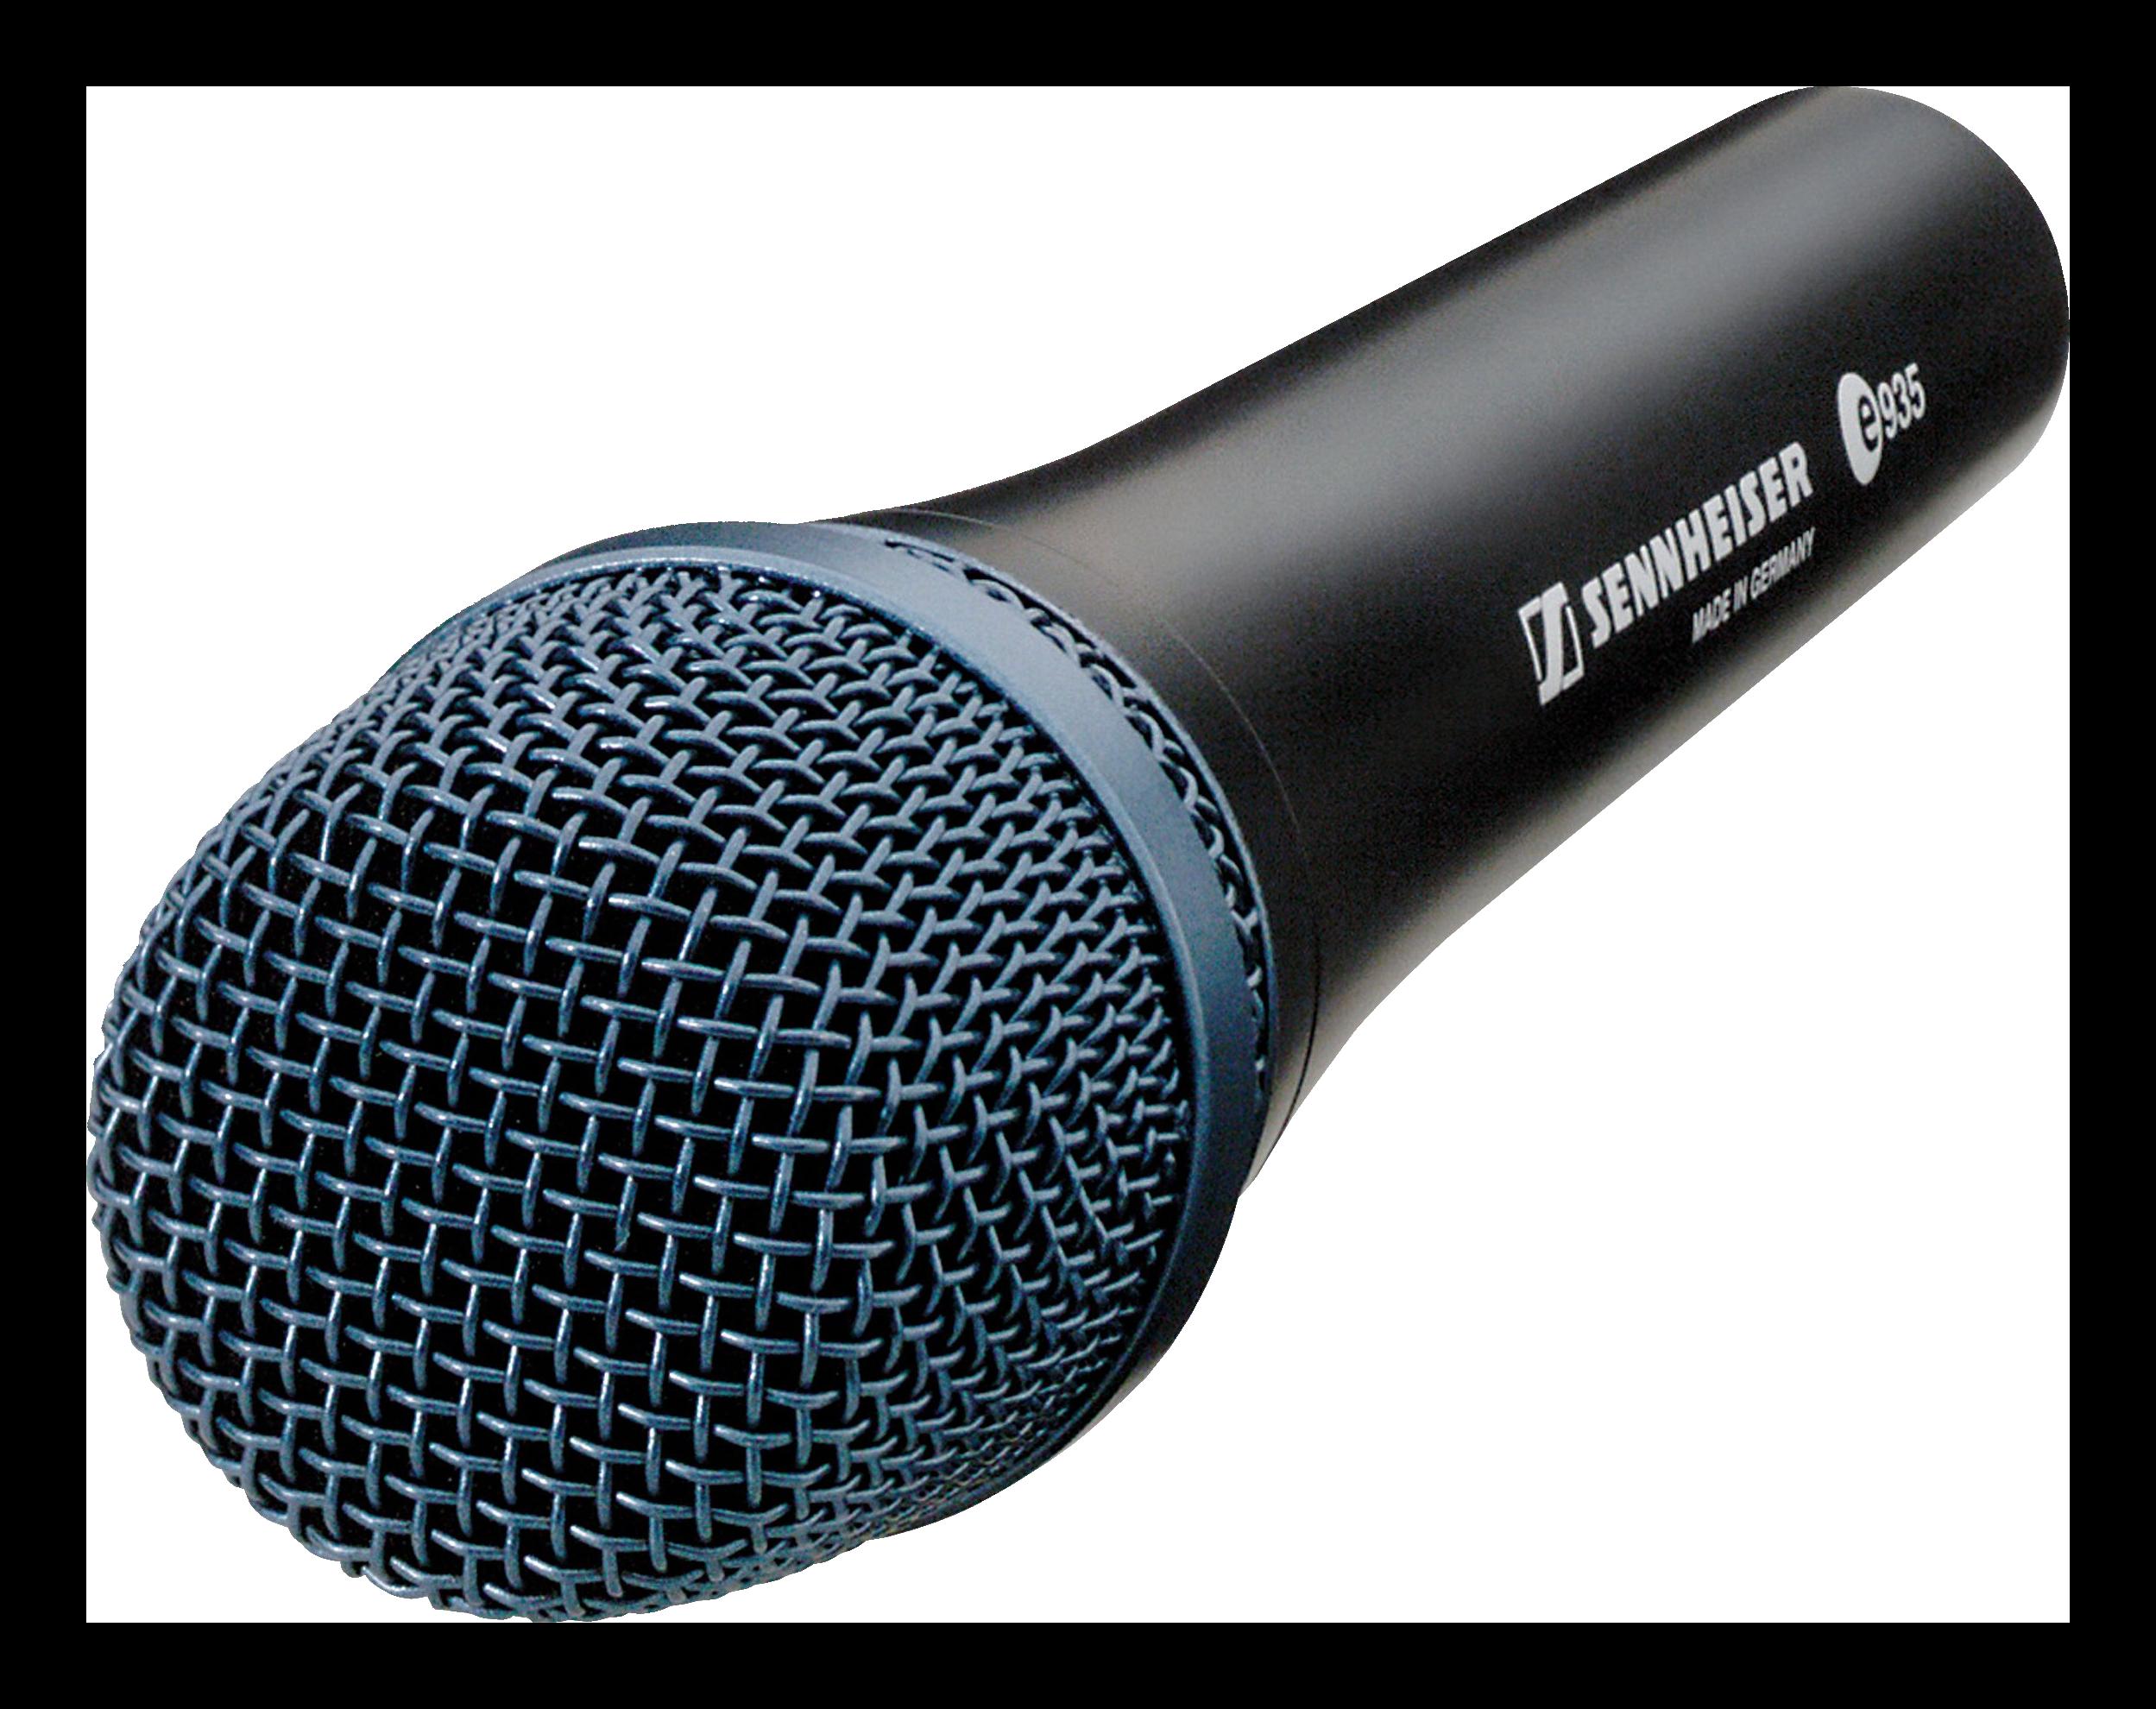 e935 microphone by sennheiser for rent apex sound light corporation. Black Bedroom Furniture Sets. Home Design Ideas